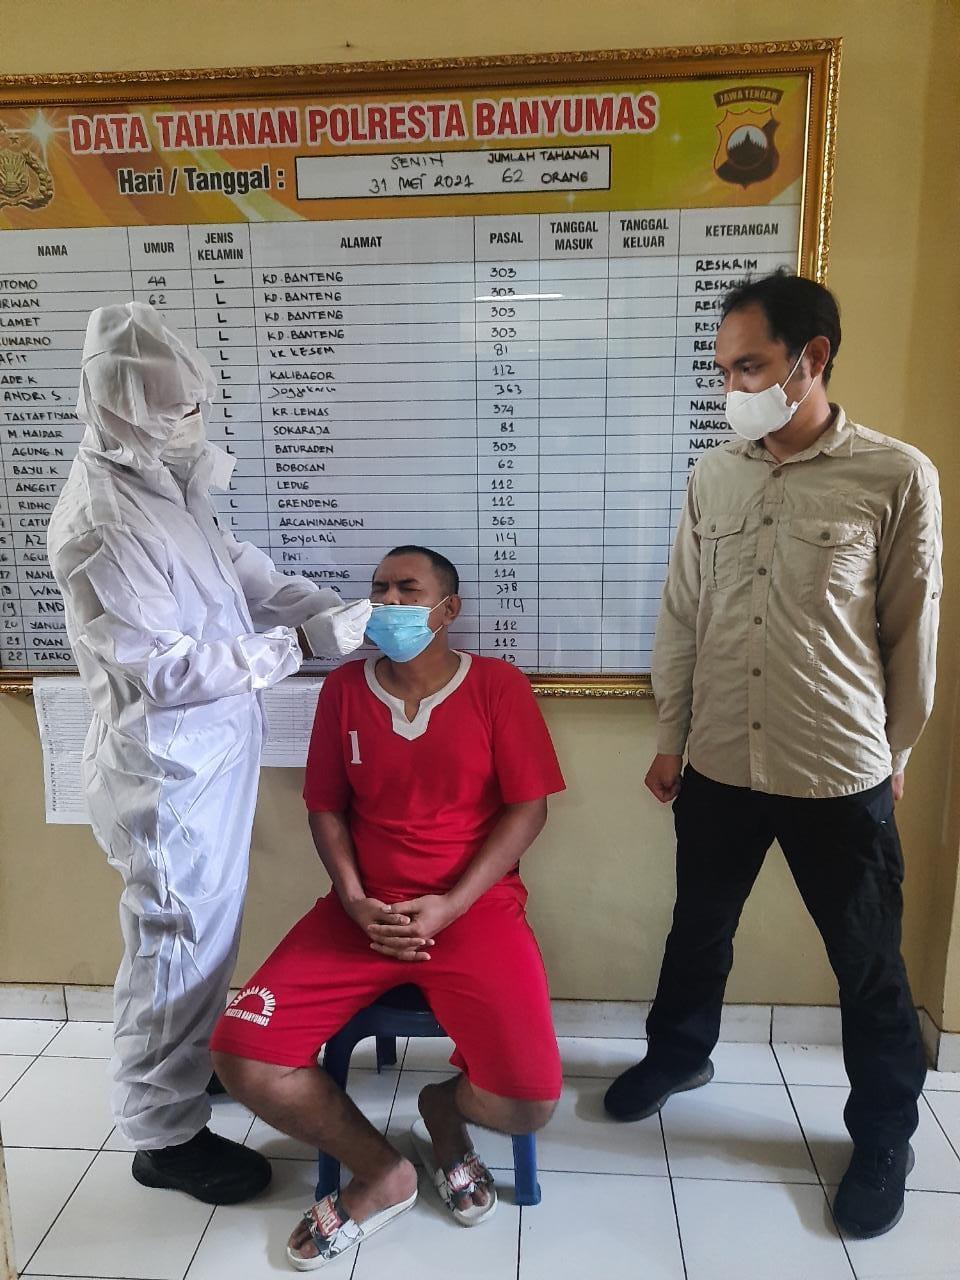 Tahanan Polresta Banyumas Jalani Swab Antigen Cegah Penyebaran Covid -19